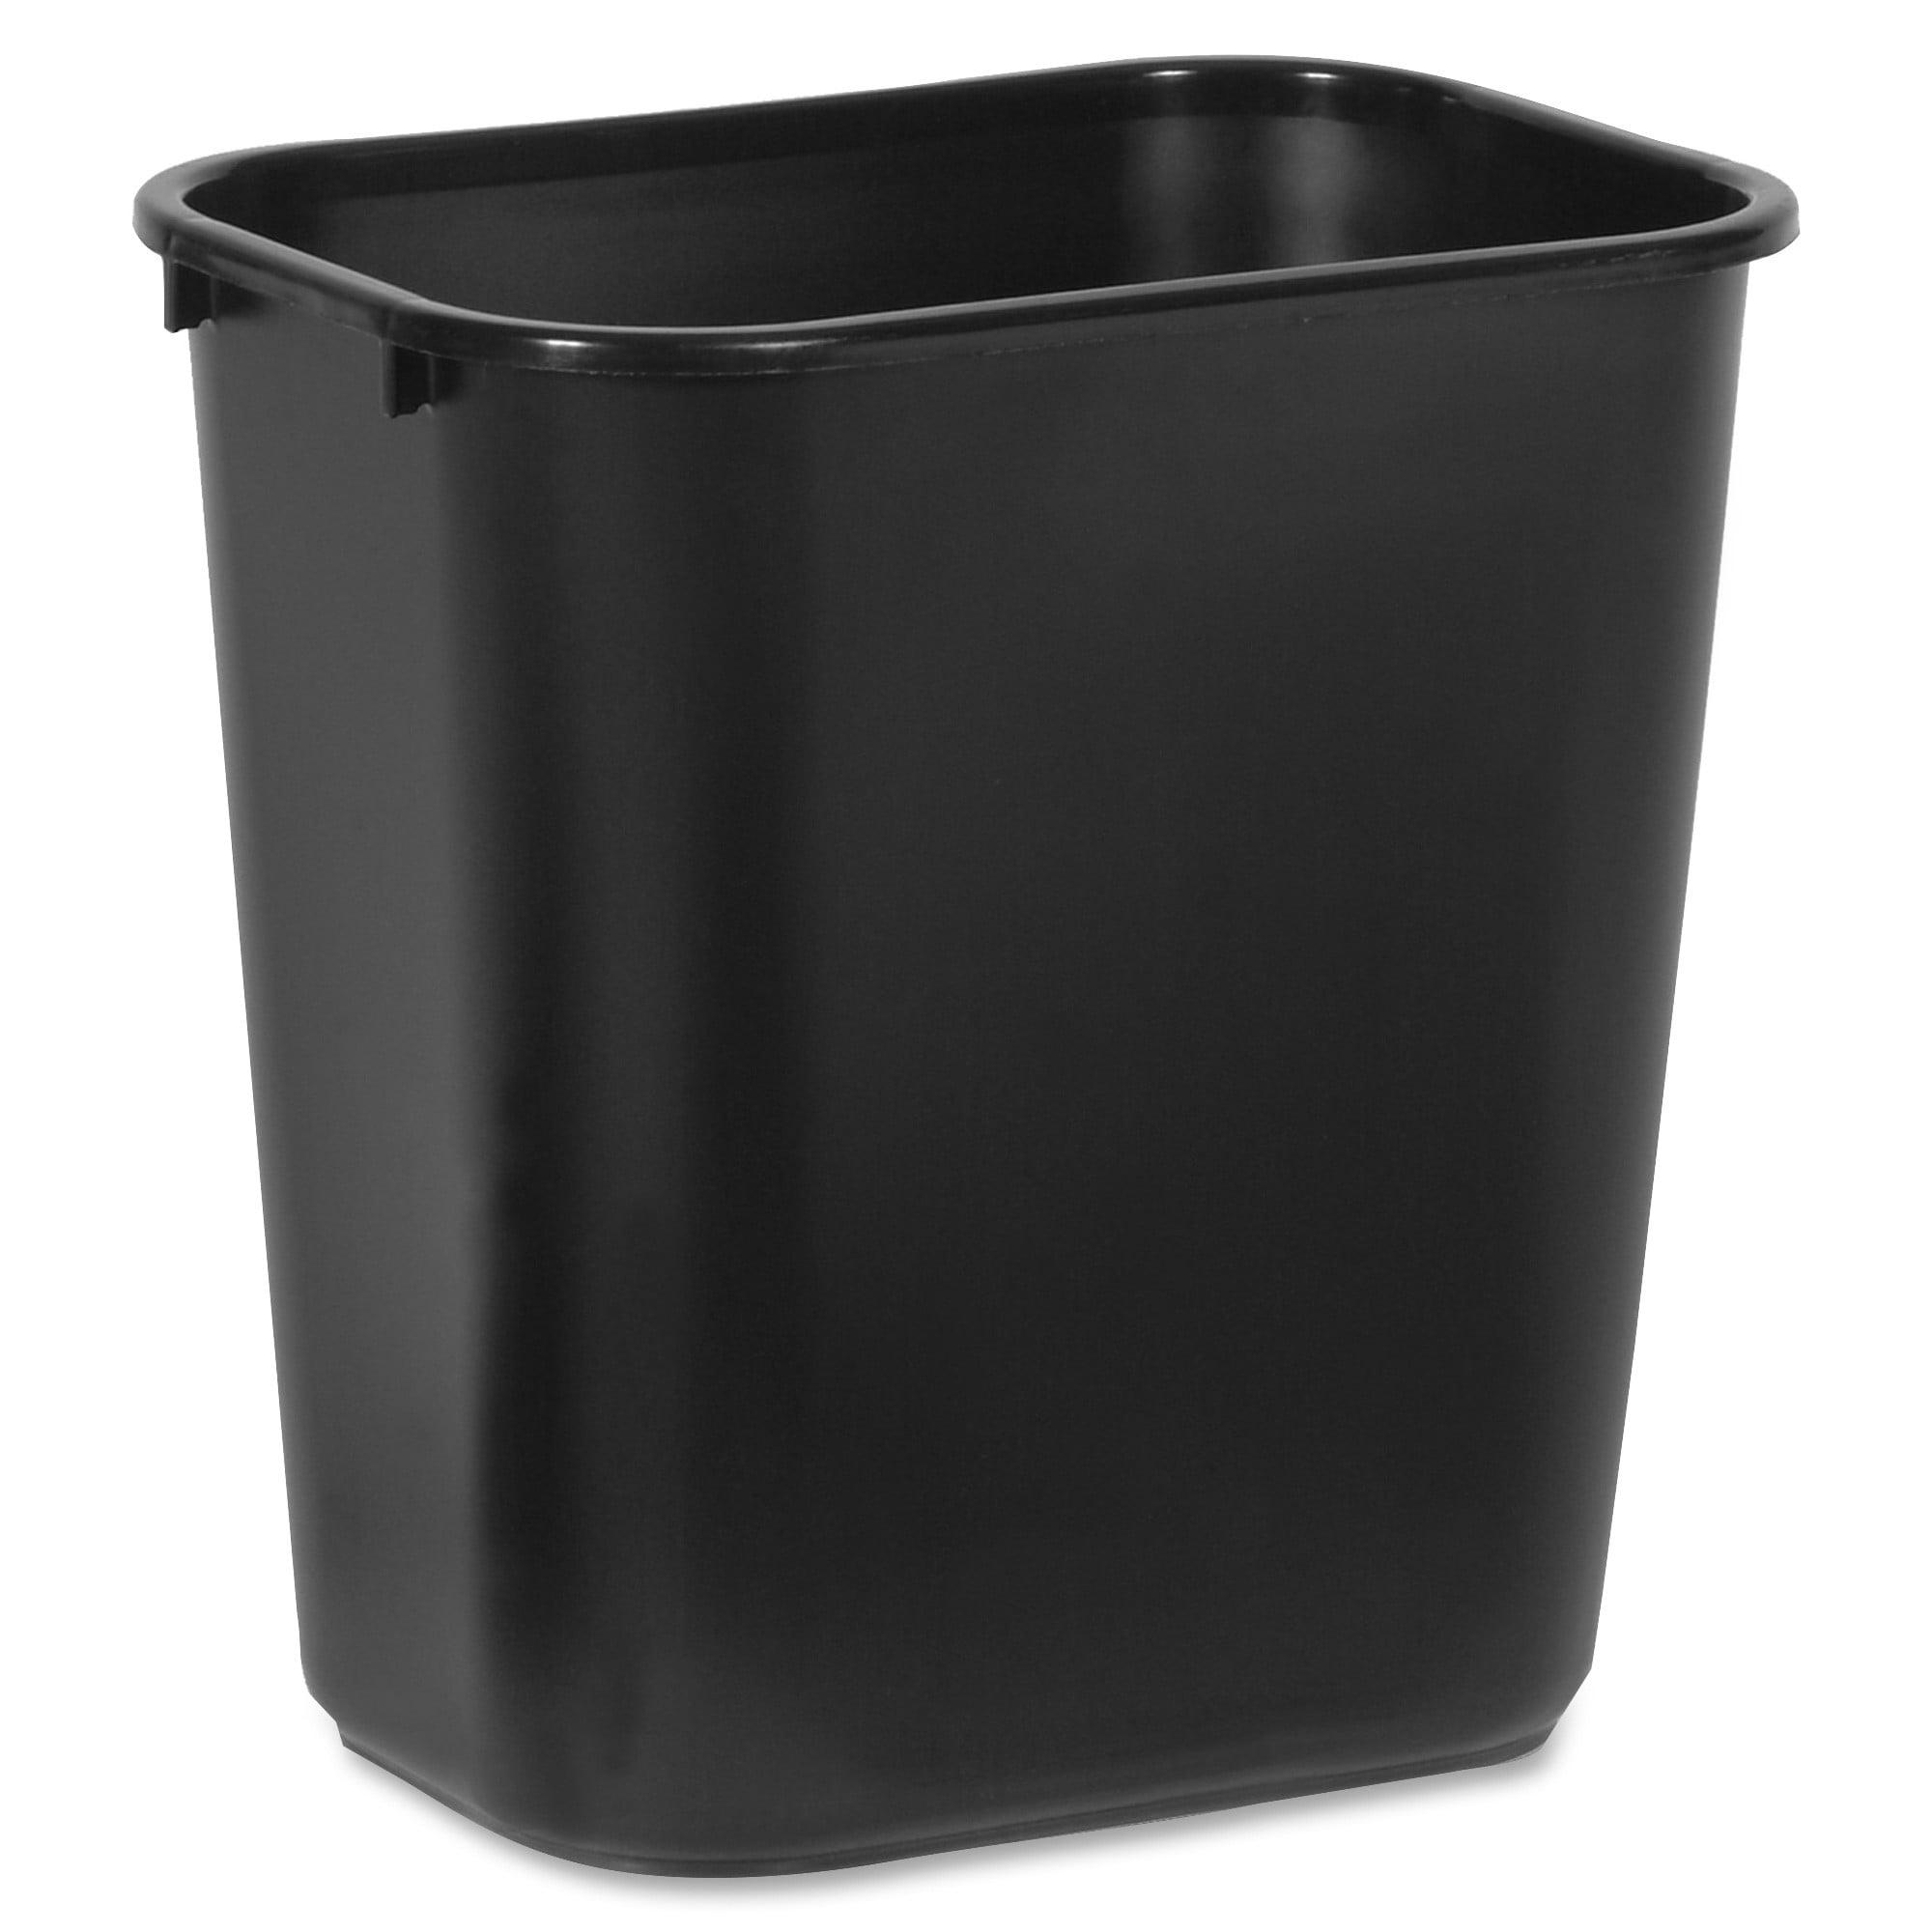 Rubbermaid Standard Series Wastebaskets